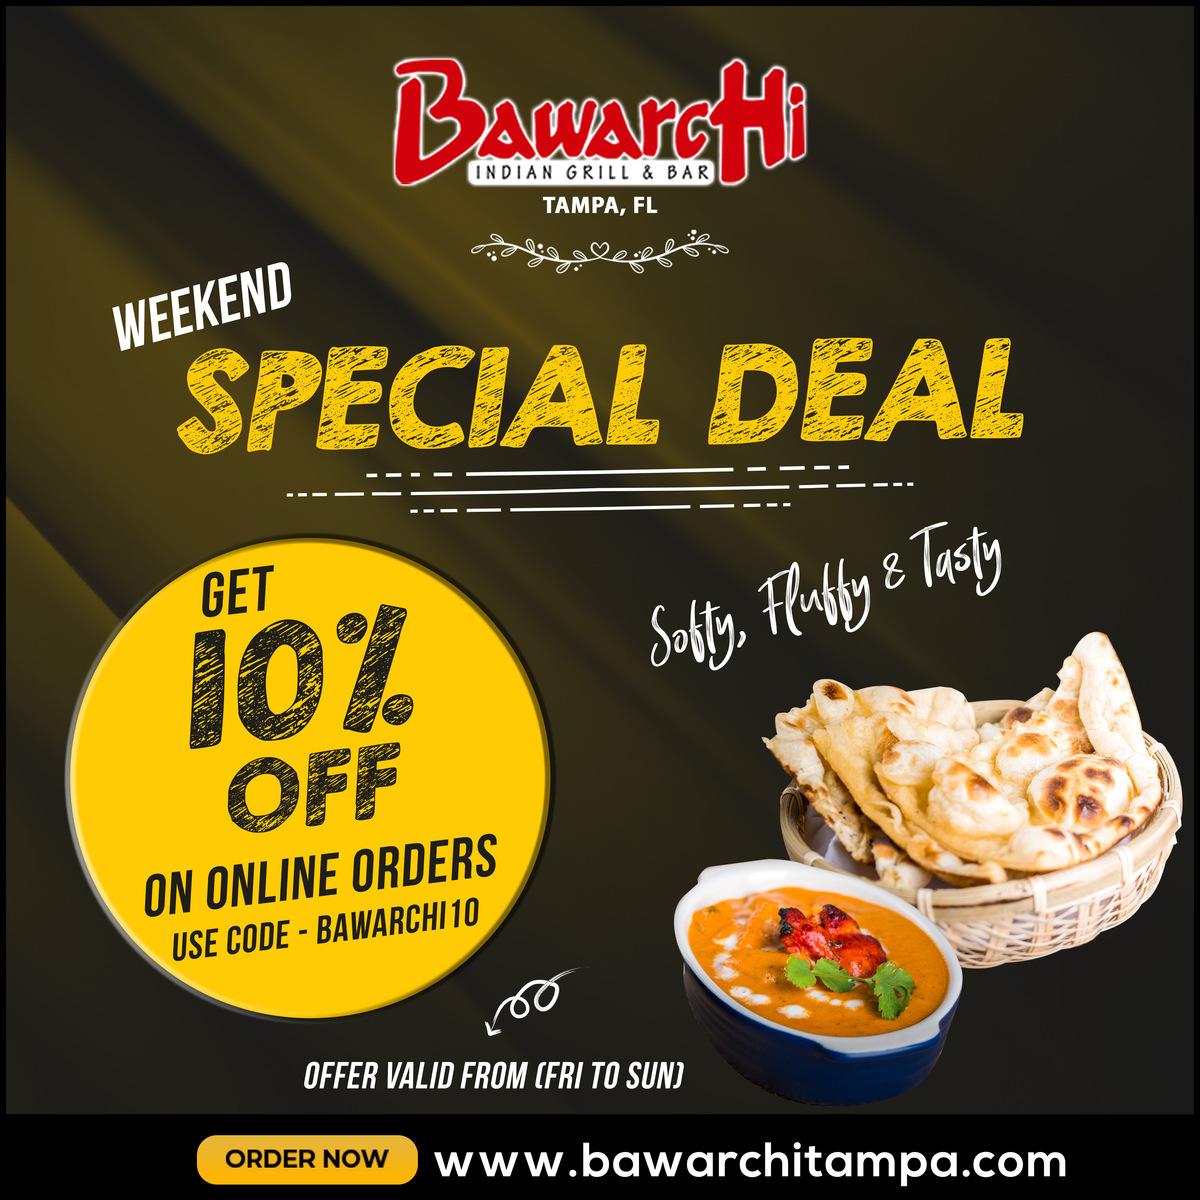 Weekend Special Deal